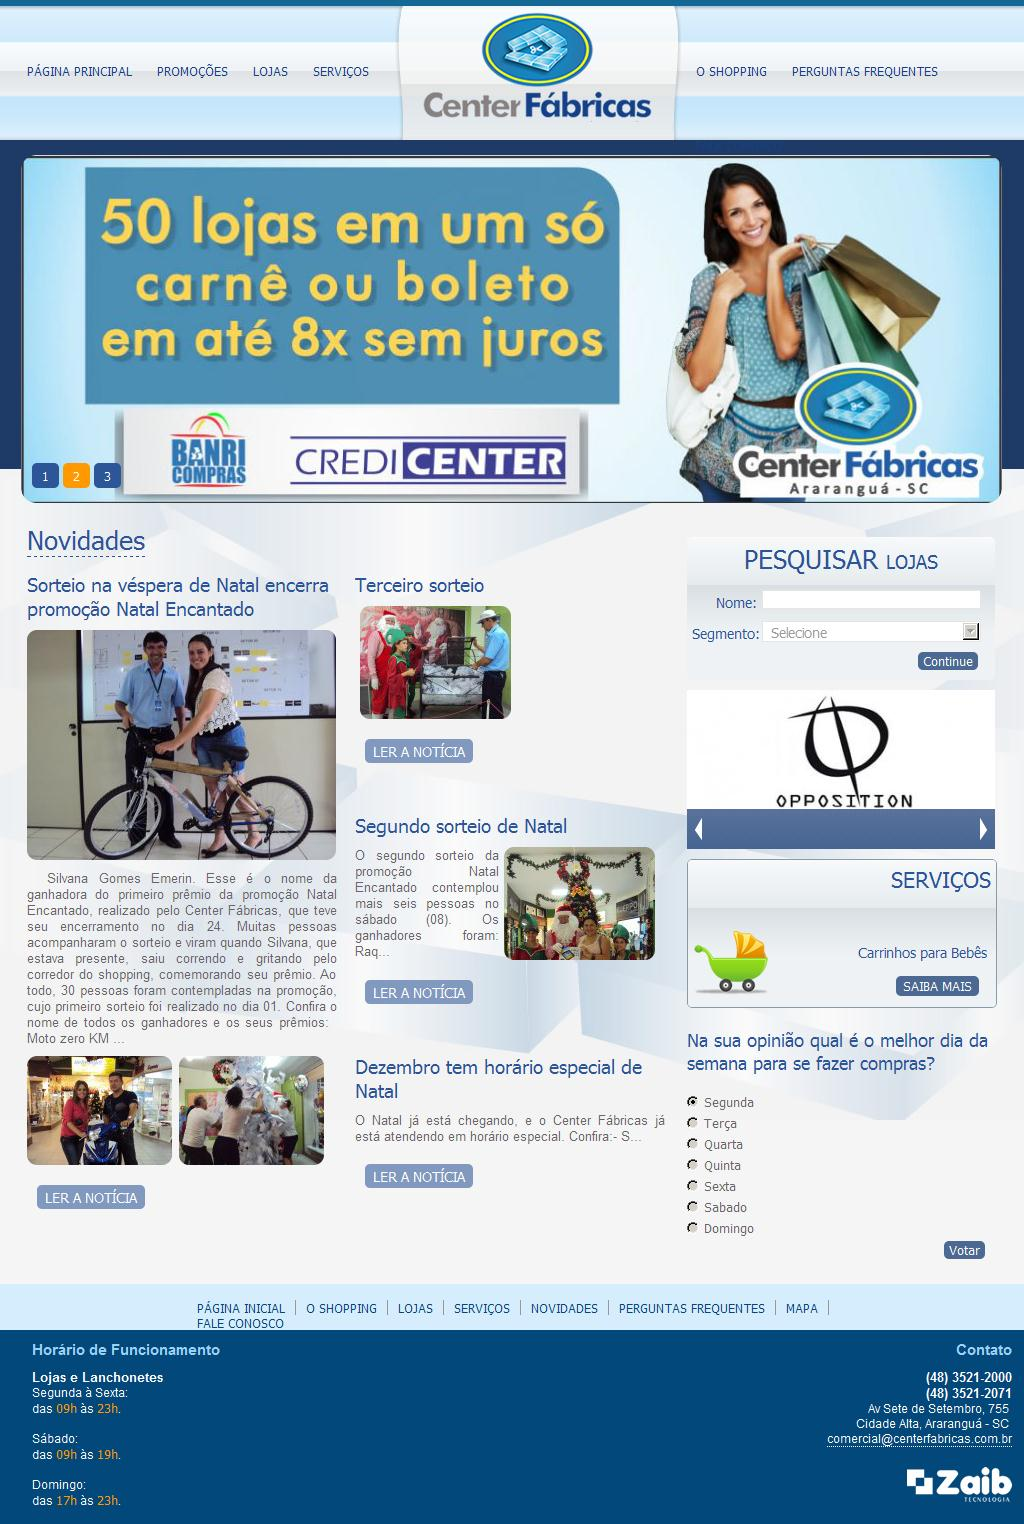 Center Fábricas - Araranguá - Santa Catarina